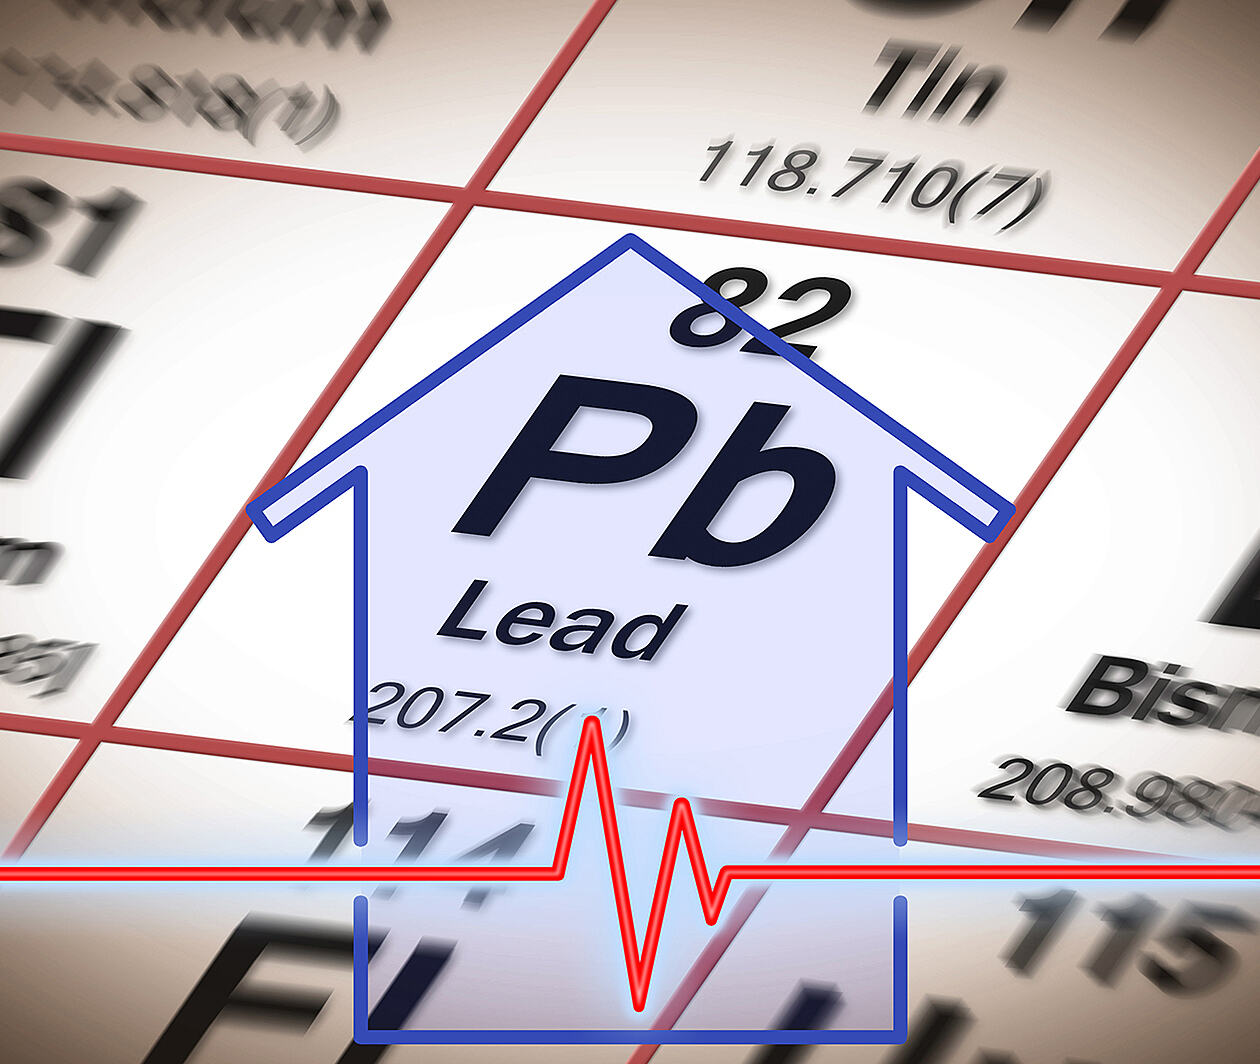 Public Health Incidents Involving Lead